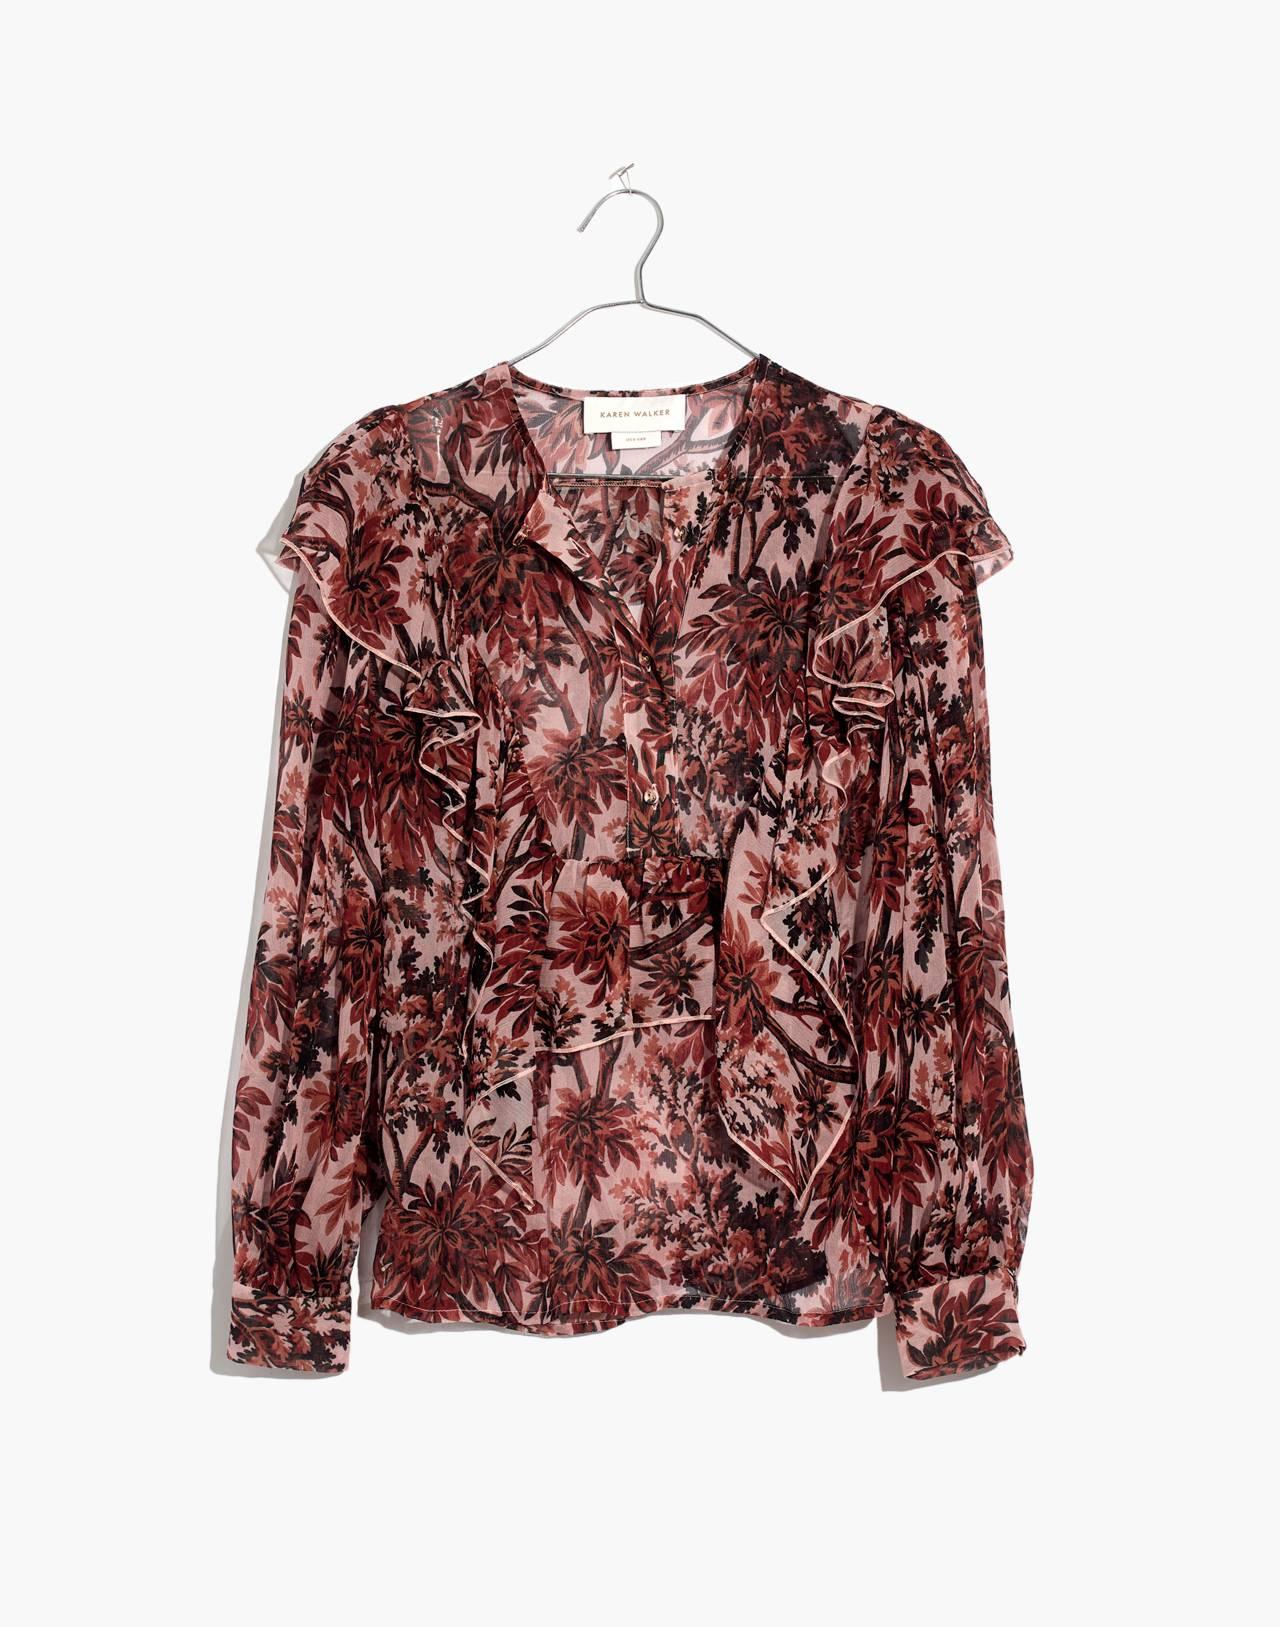 Karen Walker® Silk Eugene Ruffle Top in red multi image 4